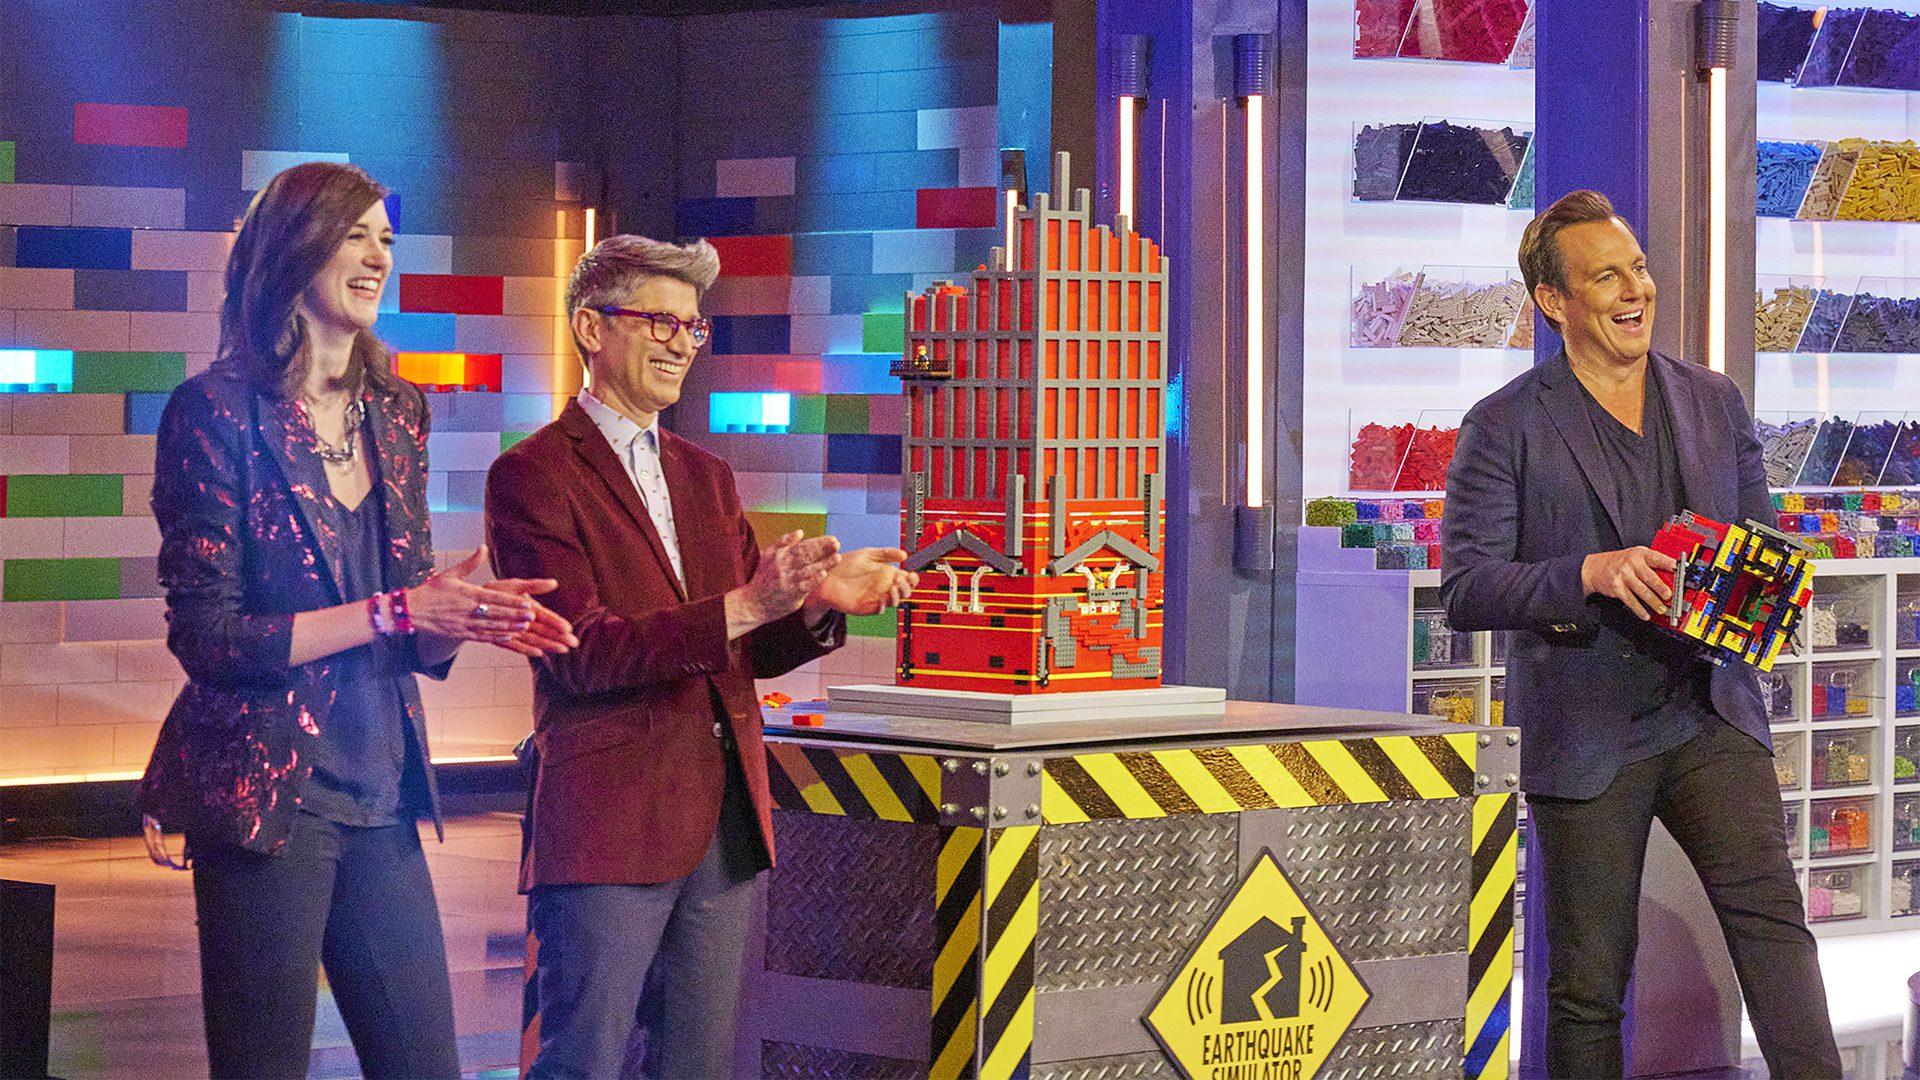 Lego Masters Season 2 Episode 8